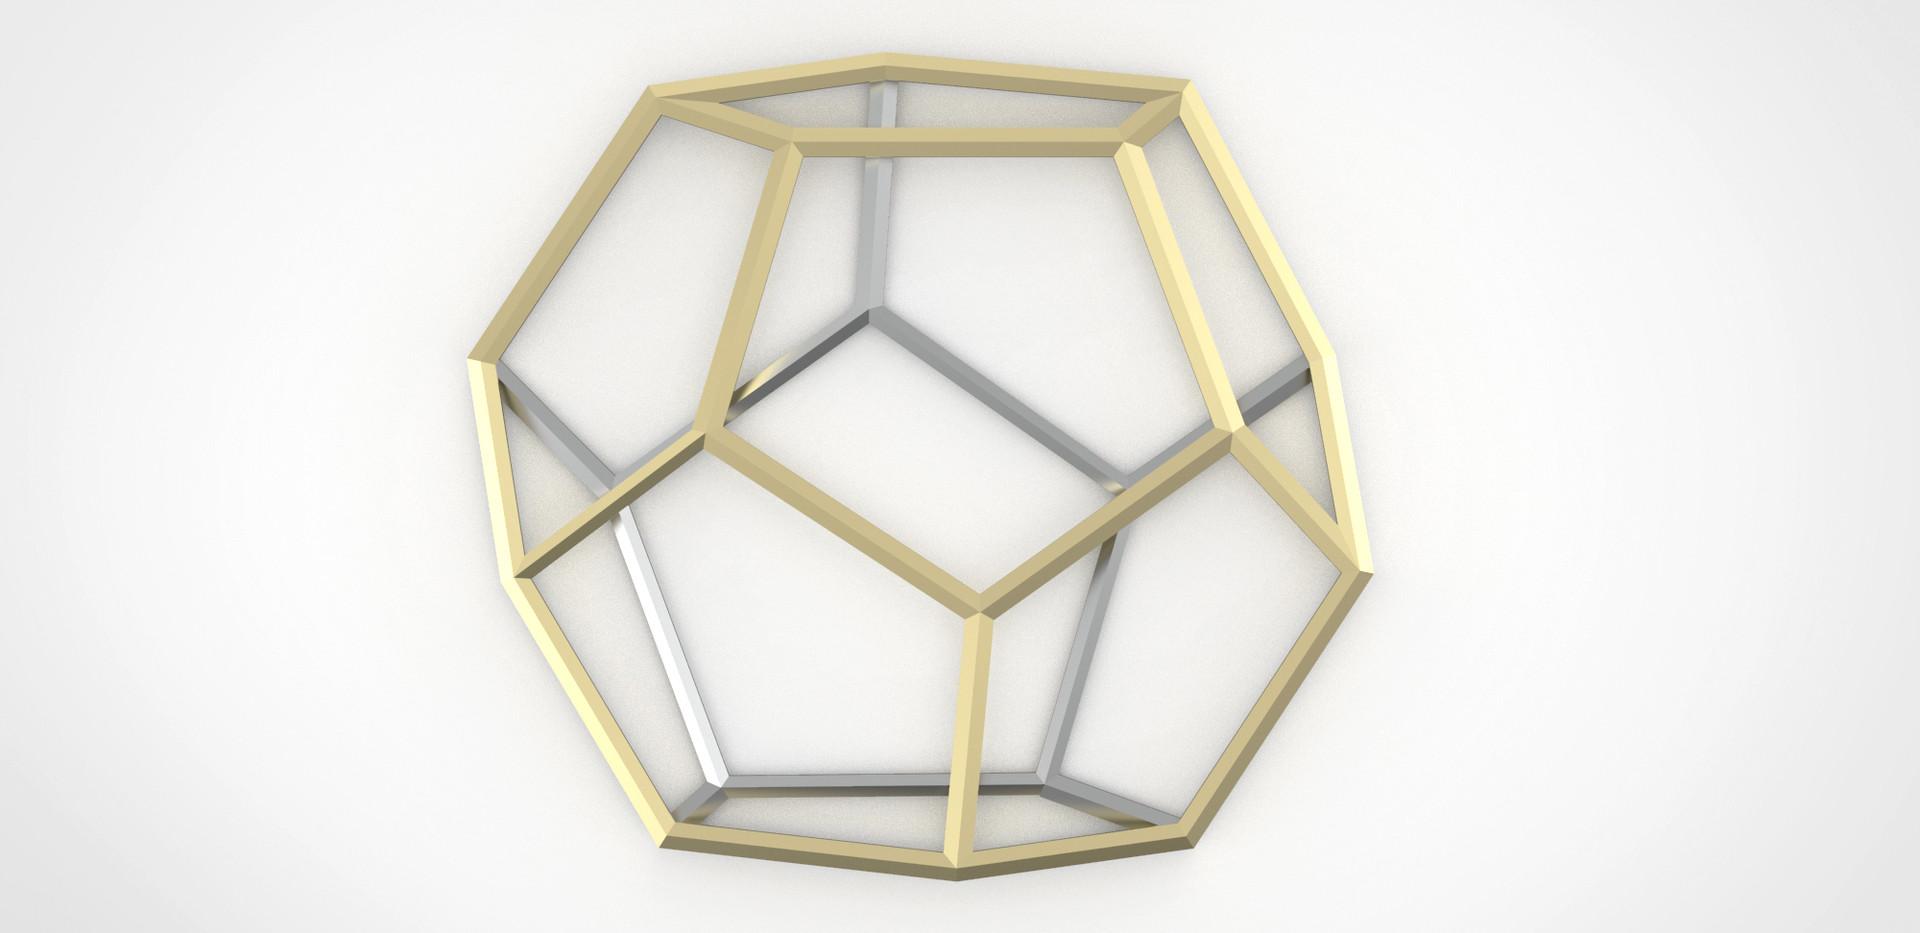 Dodecahedron trivet, Marco Guariglia Design, Size M design studio.